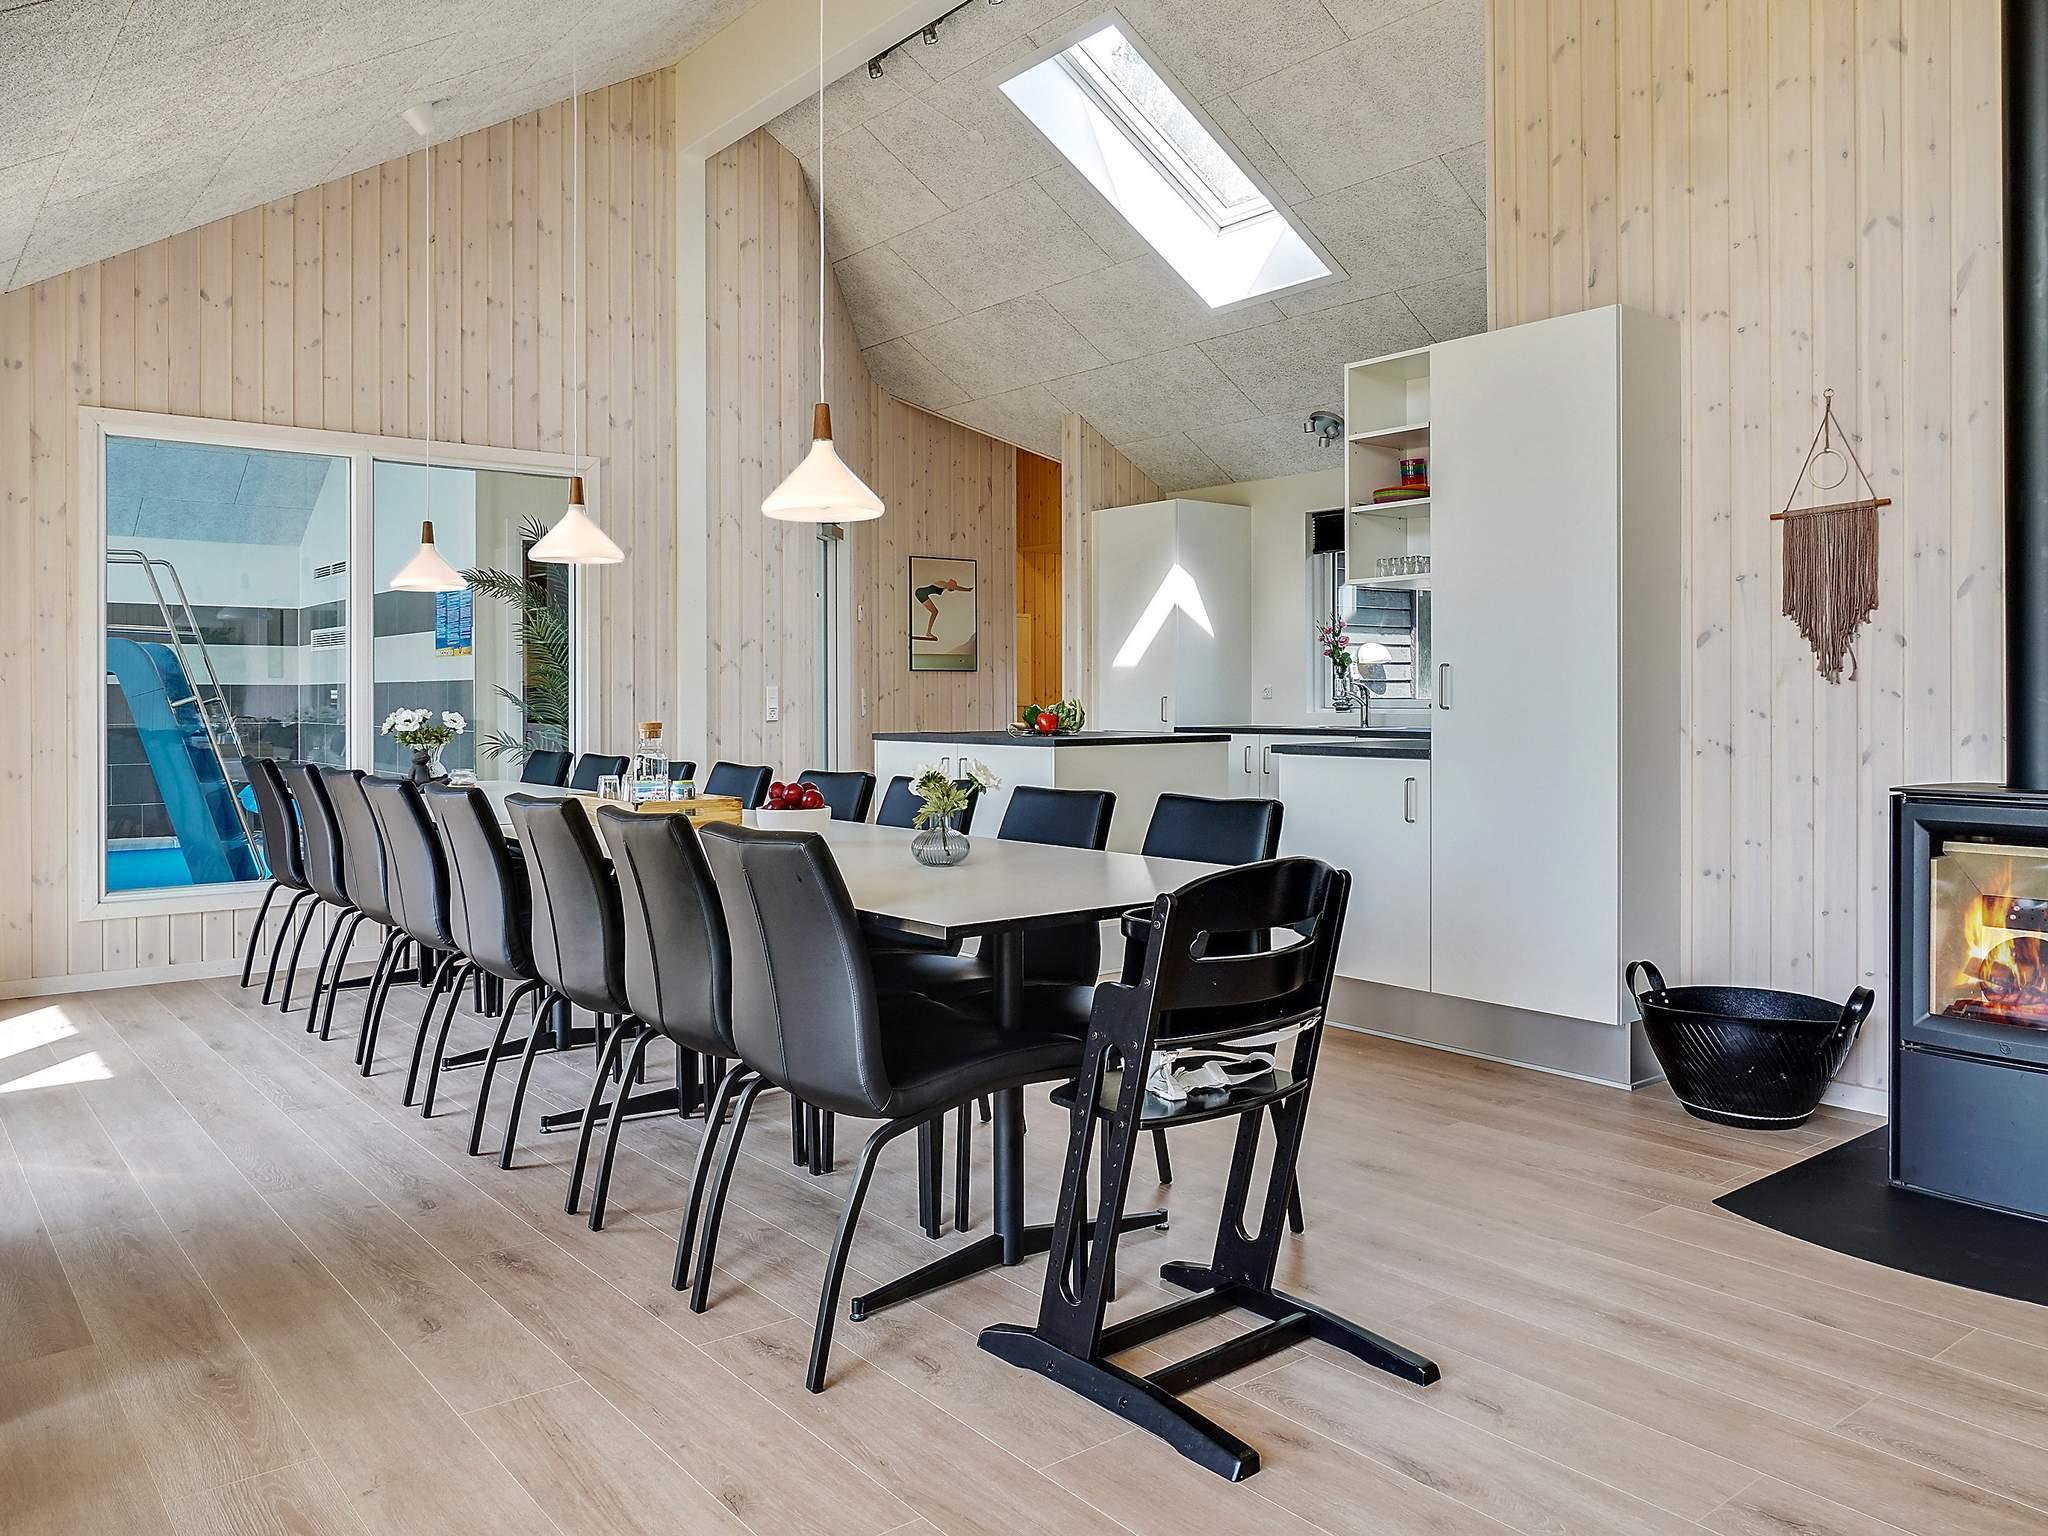 Ferienhaus Vejby Strand (2354752), Vejby, , Nordseeland, Dänemark, Bild 4